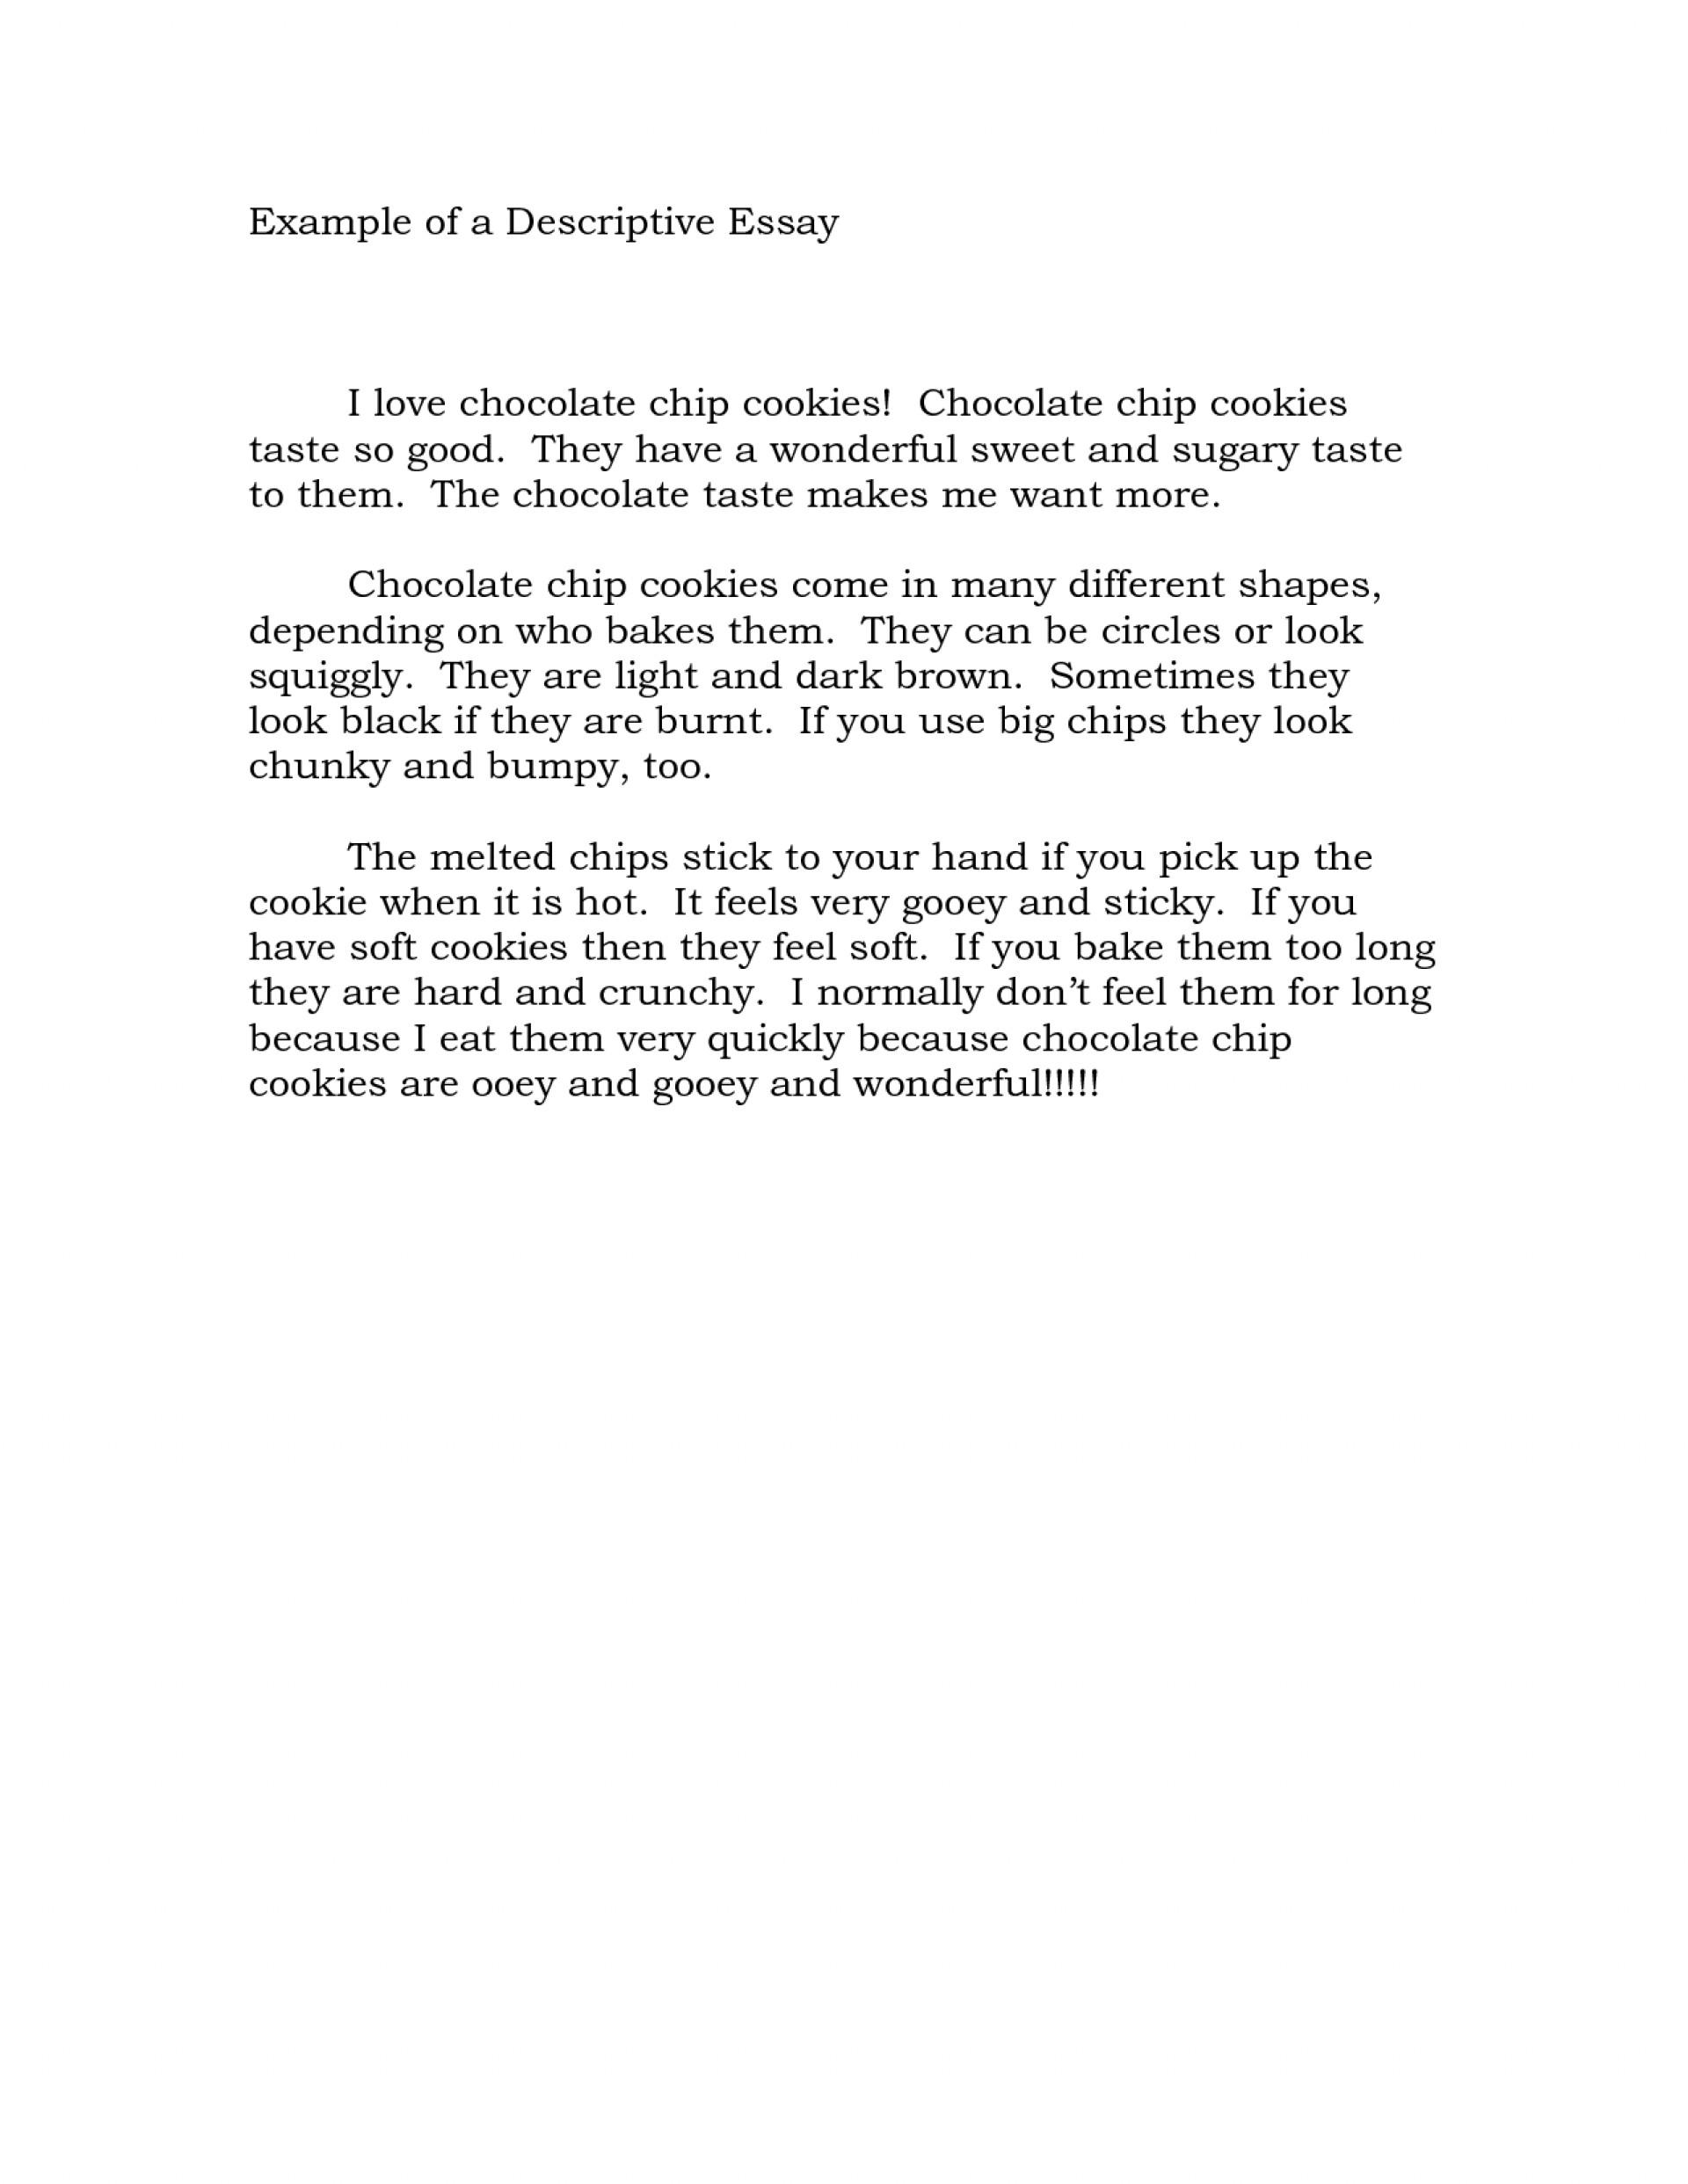 017 Descriptive Essay Outlines 705115 Outstanding Outline Template Pdf About A Person 1920